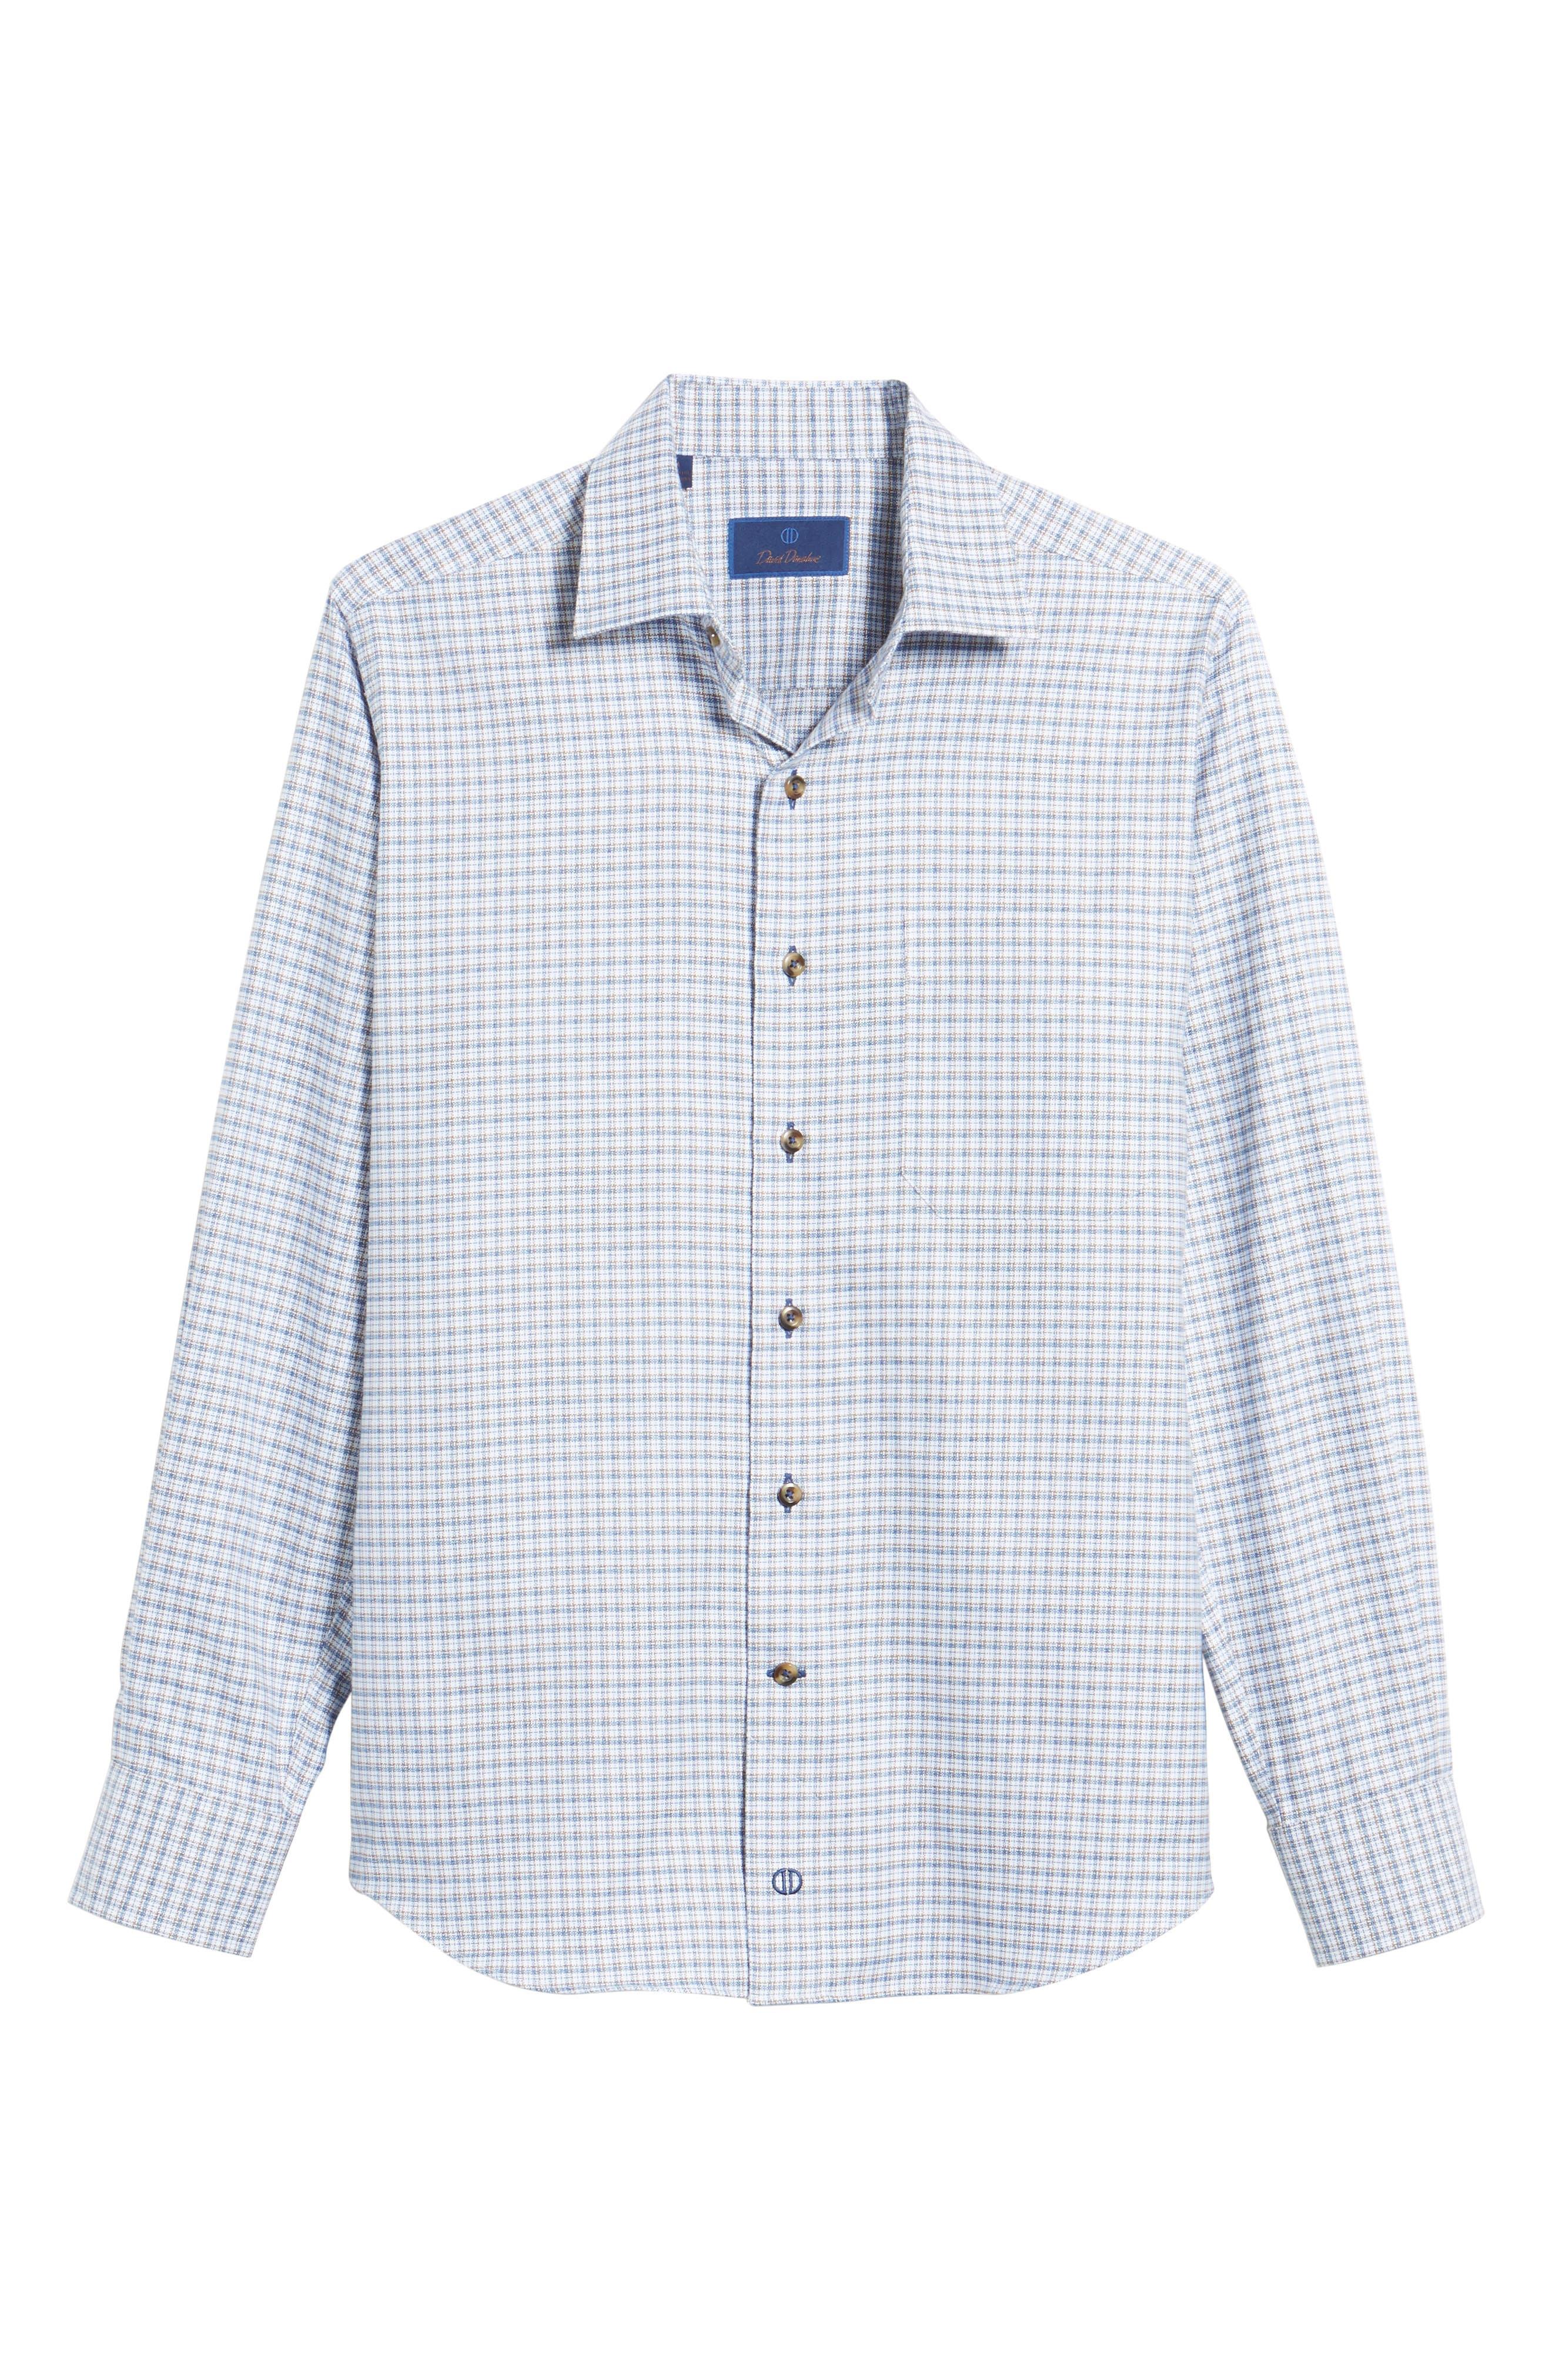 Regular Fit Plaid Sport Shirt,                             Alternate thumbnail 6, color,                             423